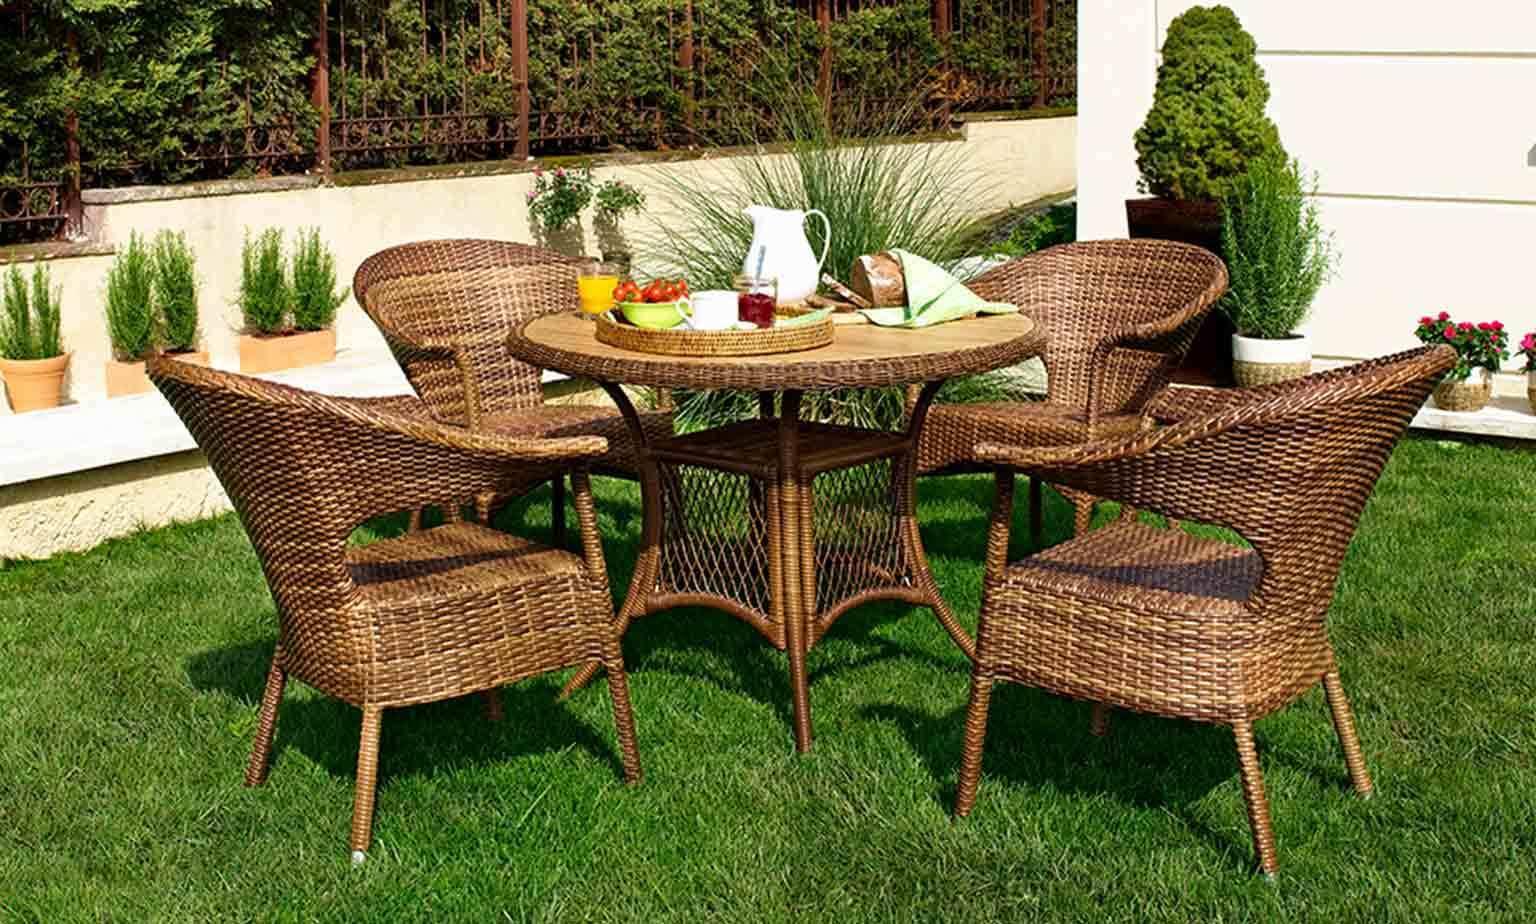 Patio Furniture, Lawnmowers, BBQs & Sheds